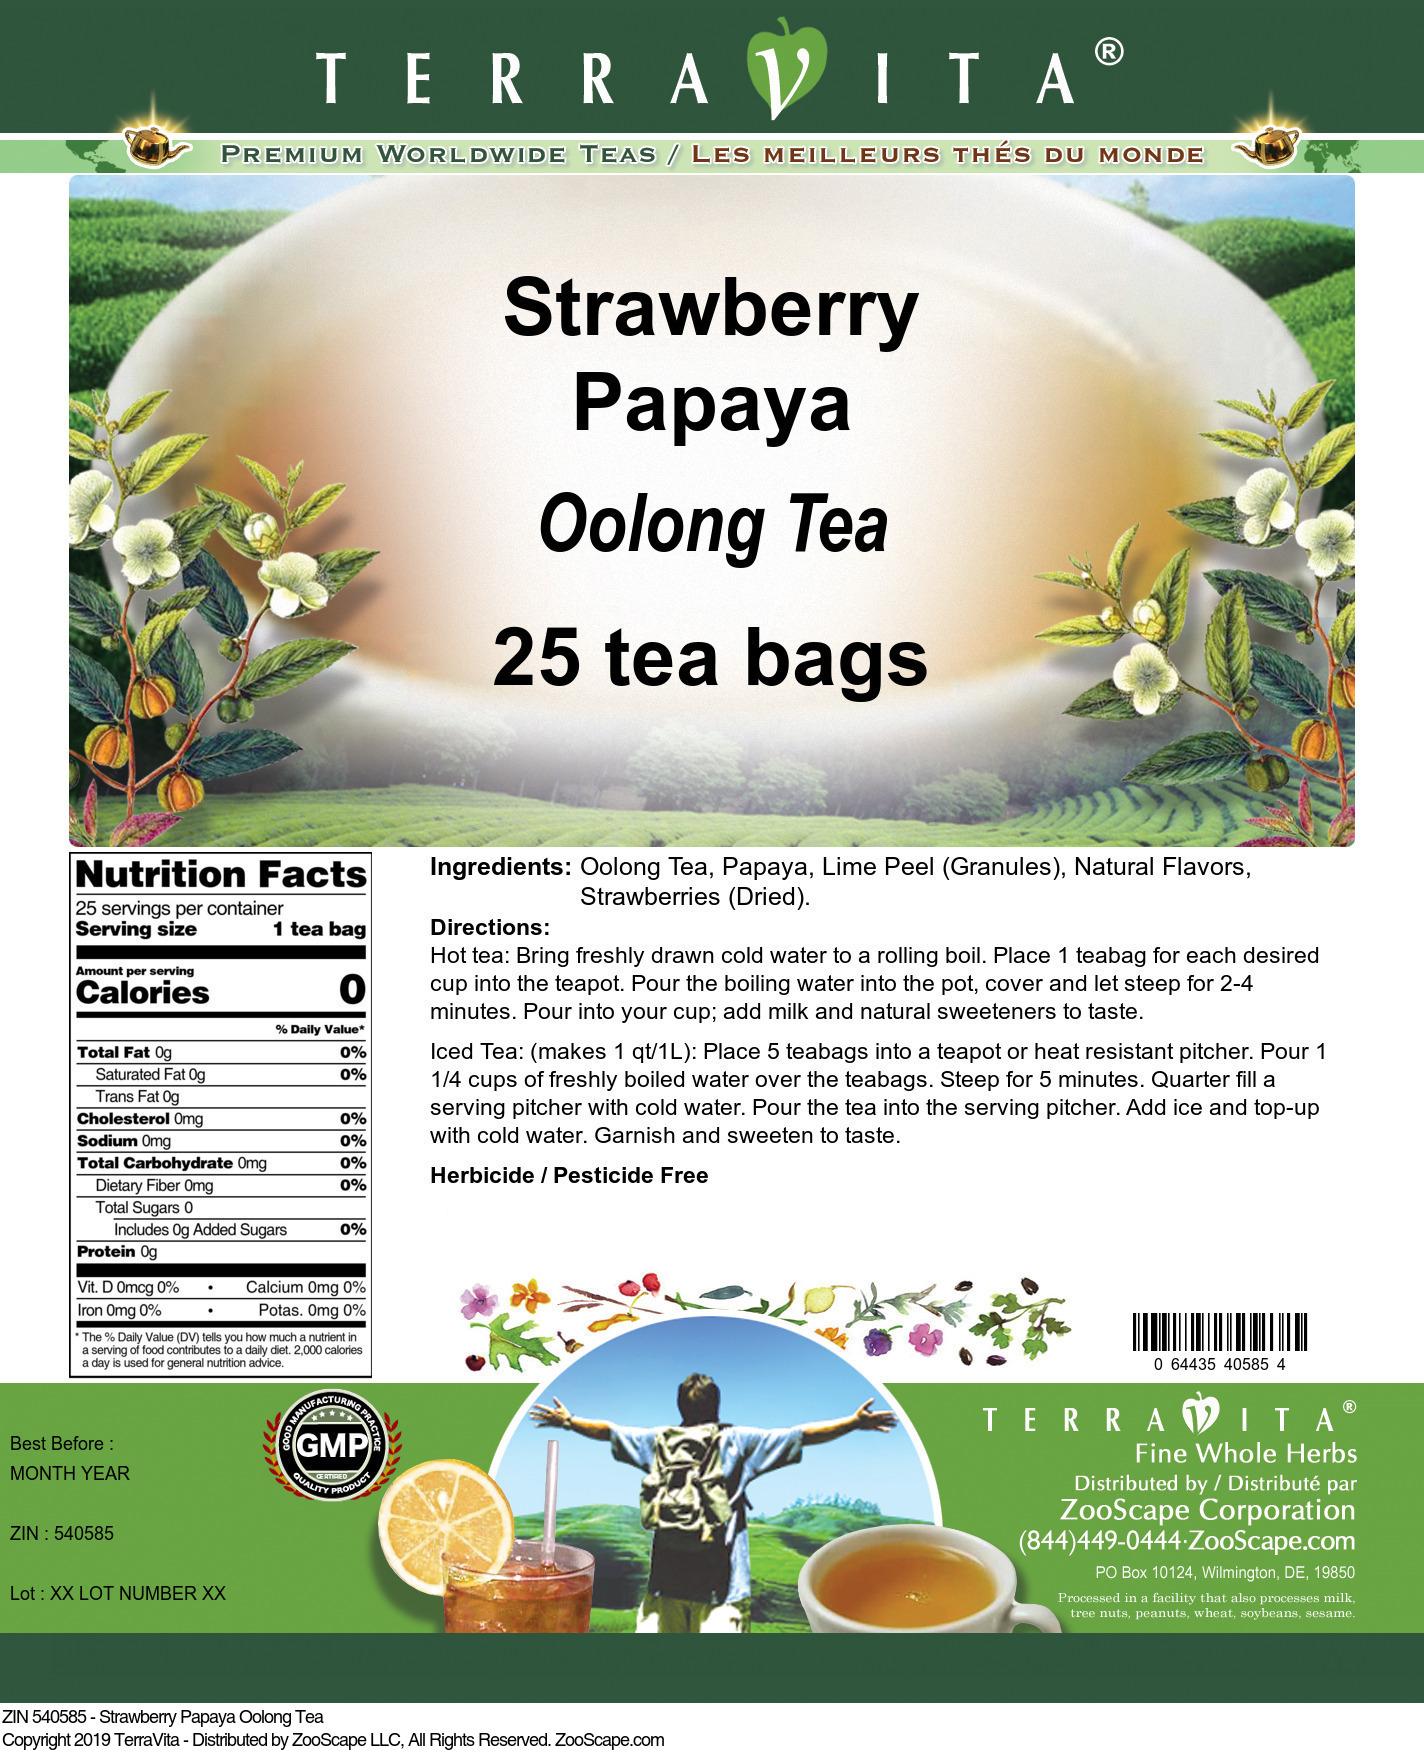 Strawberry Papaya Oolong Tea